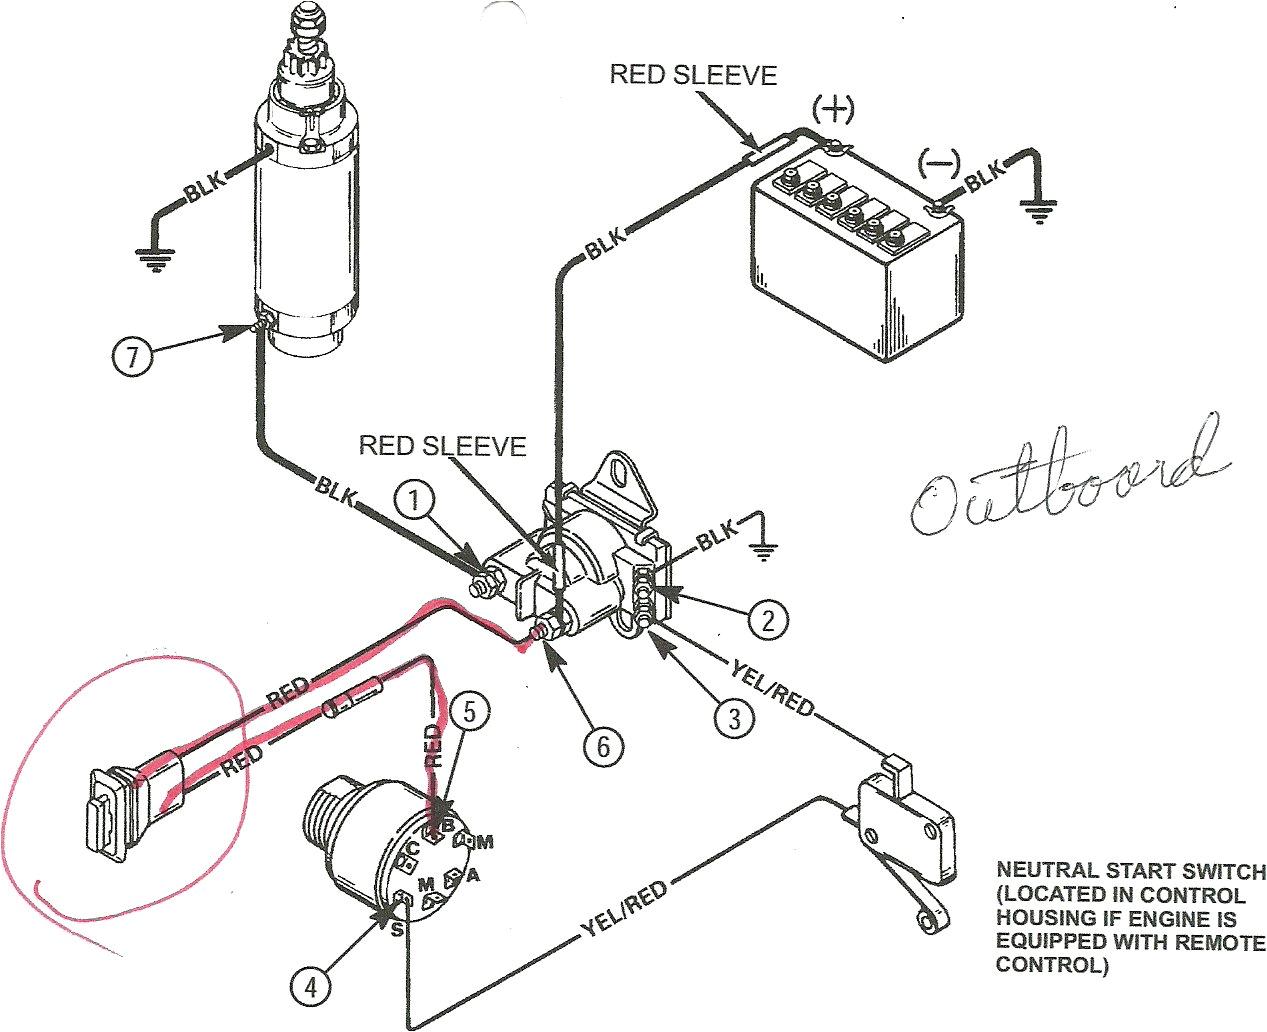 boat starter diagram electrical wiring diagram boat starter diagram